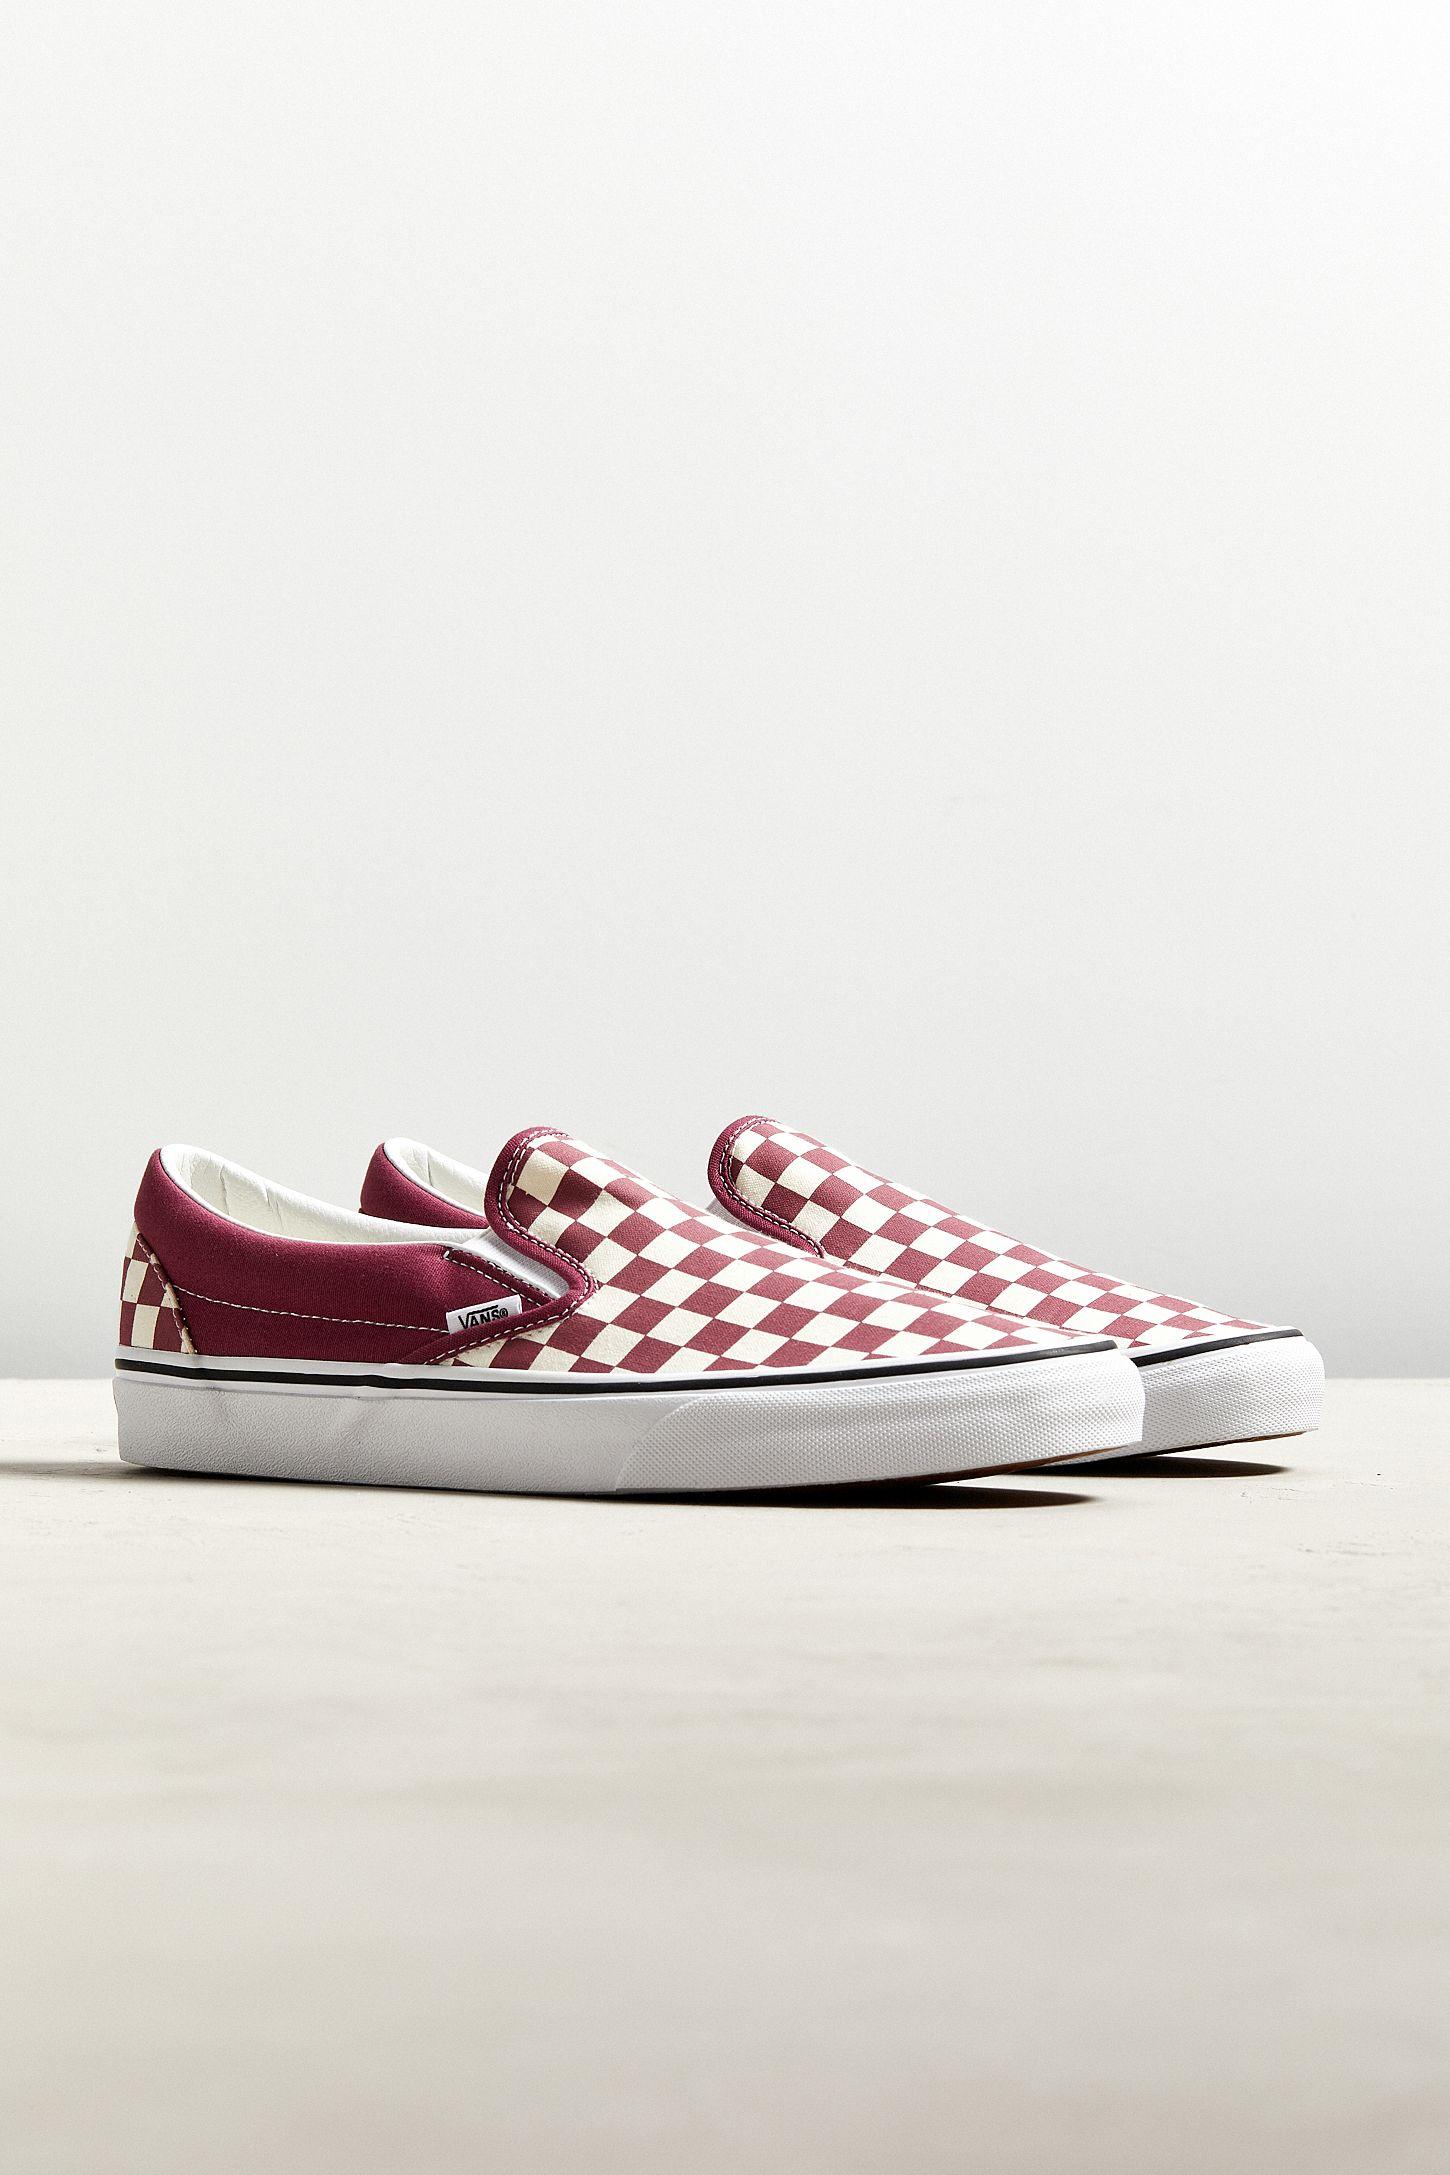 4403c0ee4f893b Vans Classic Colorful Checkerboard Slip-On Sneaker